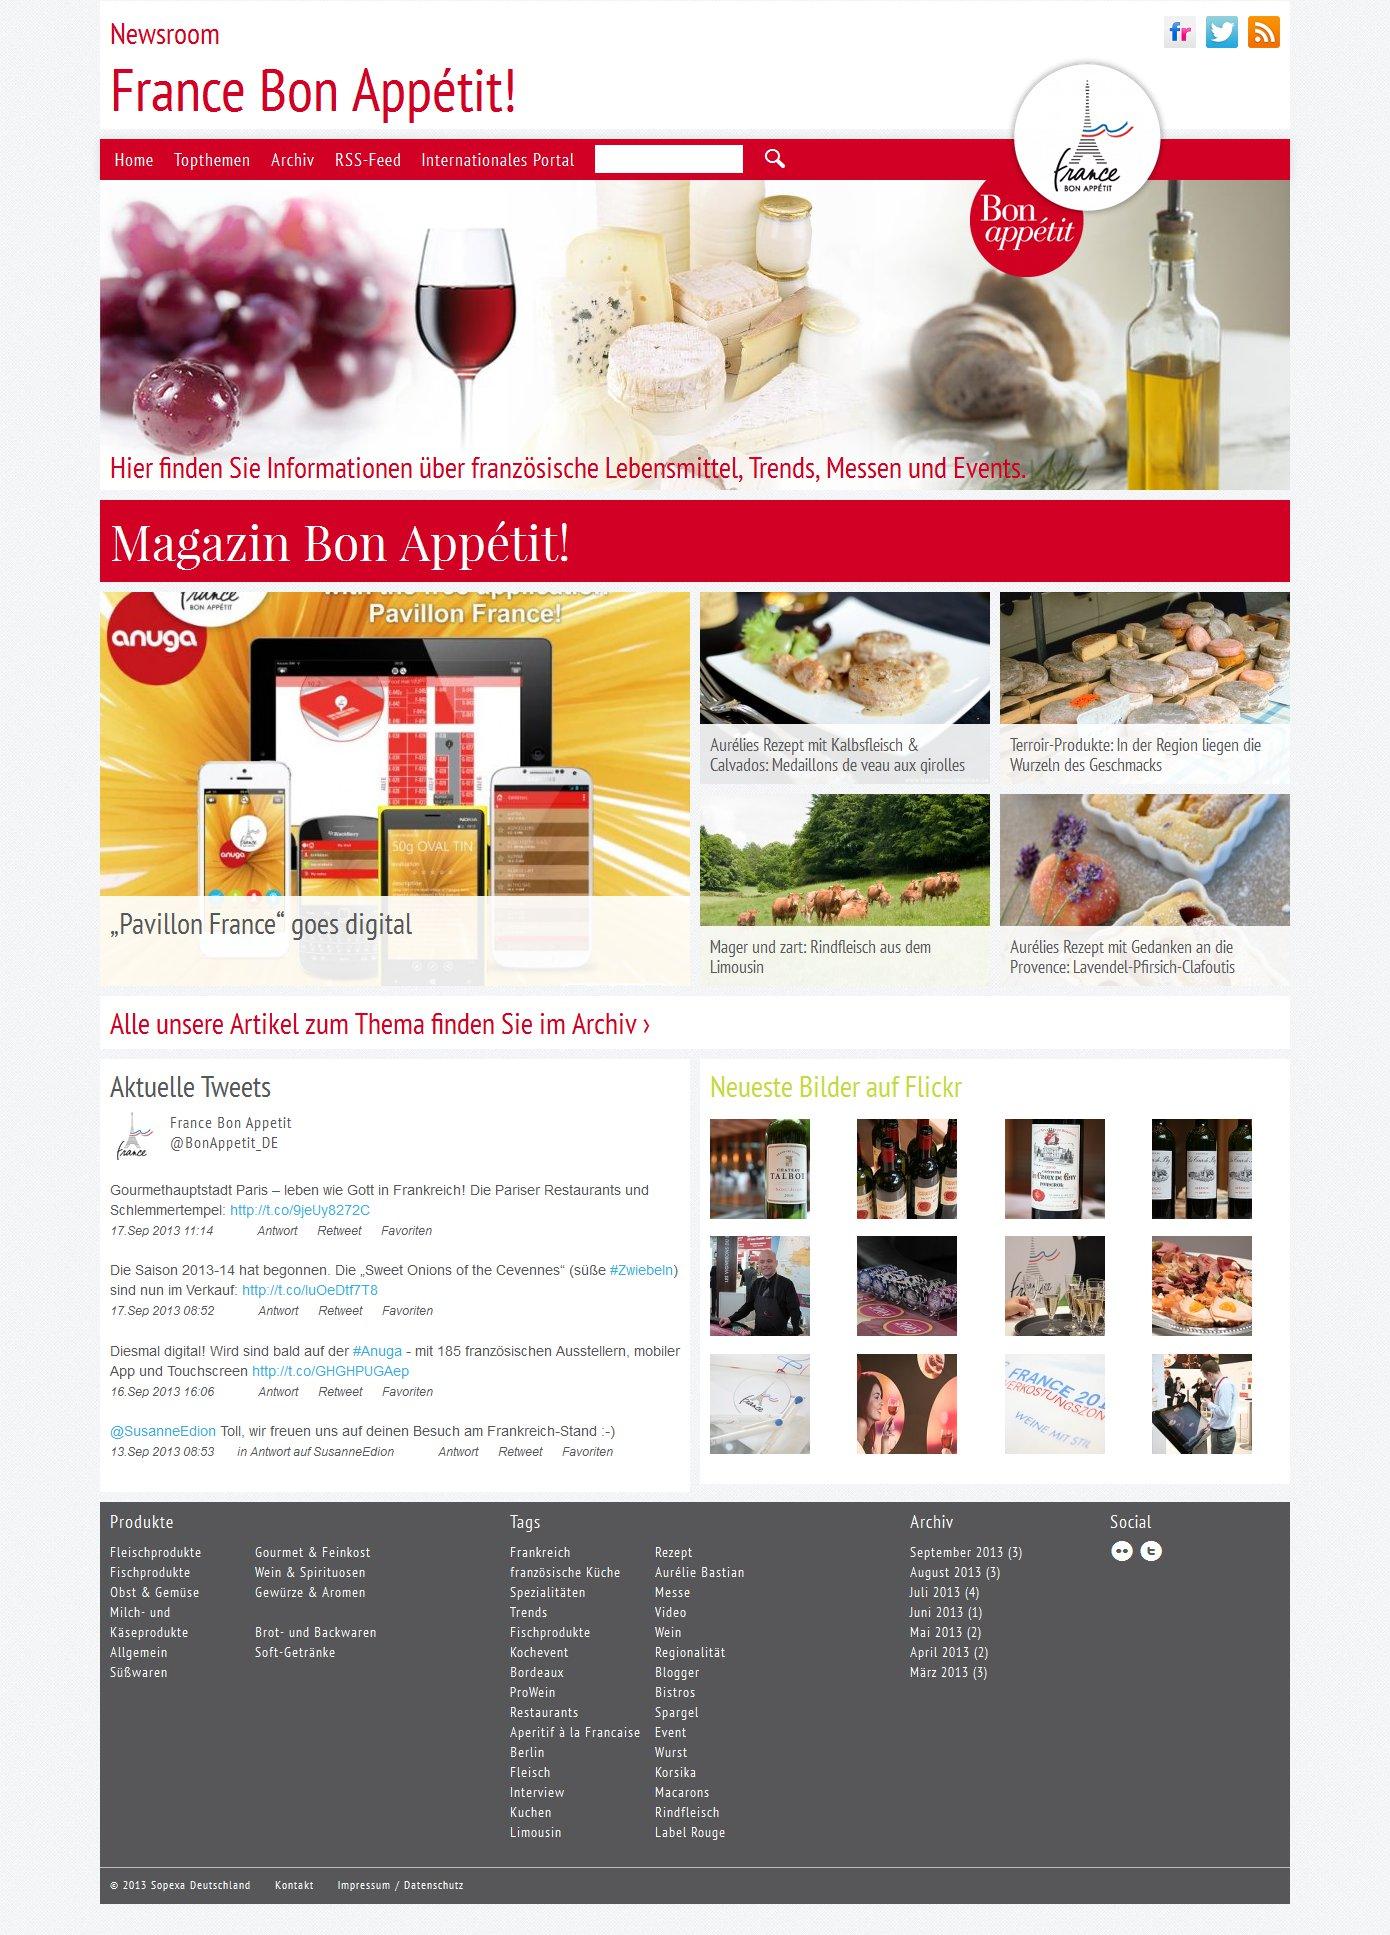 France Bon Appétit! Newsroom Startseite